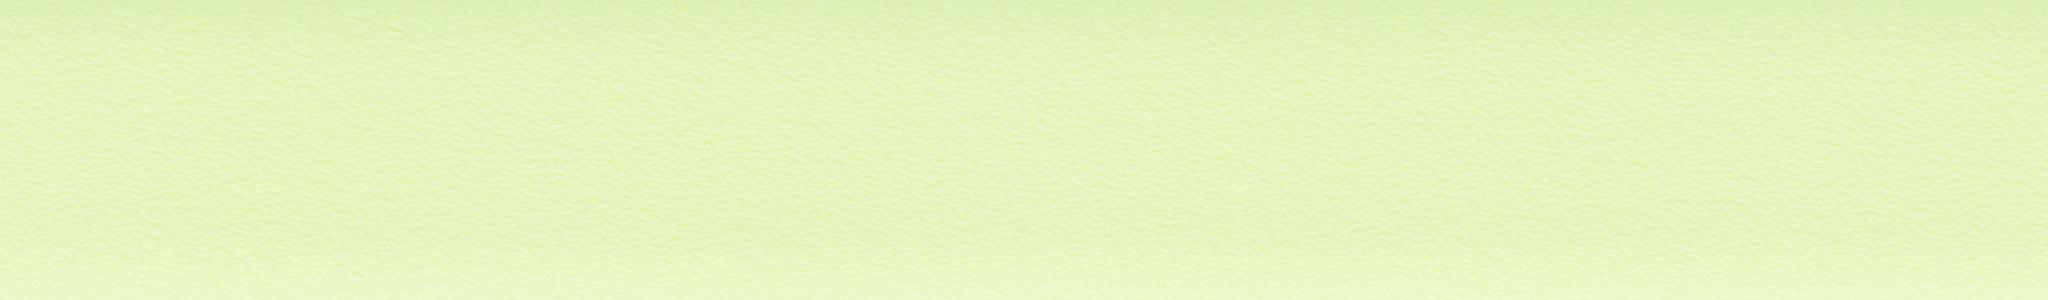 HU 16634 ABS Edge Green Pearl 101